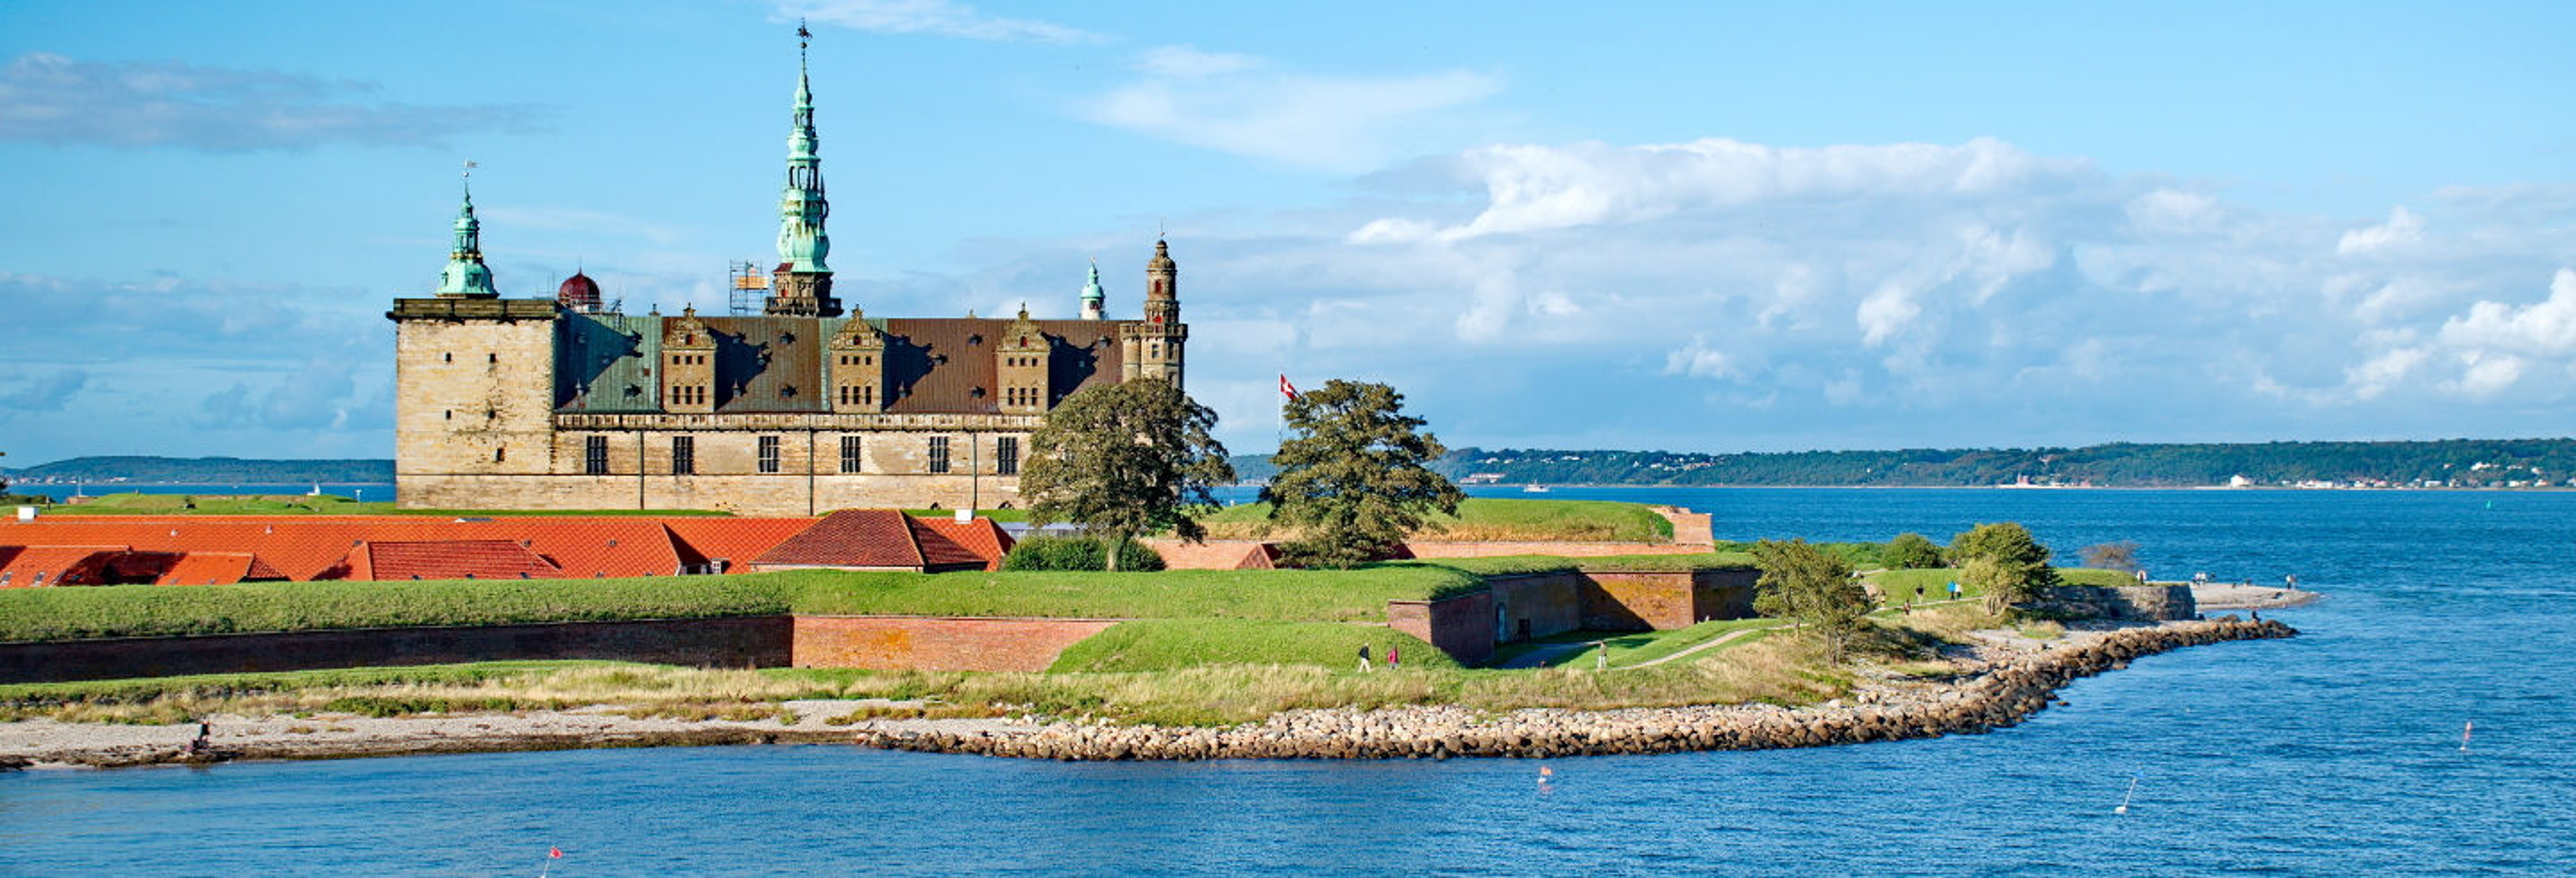 Castelos de Kronborg,Frederiksborg e Fredensborg